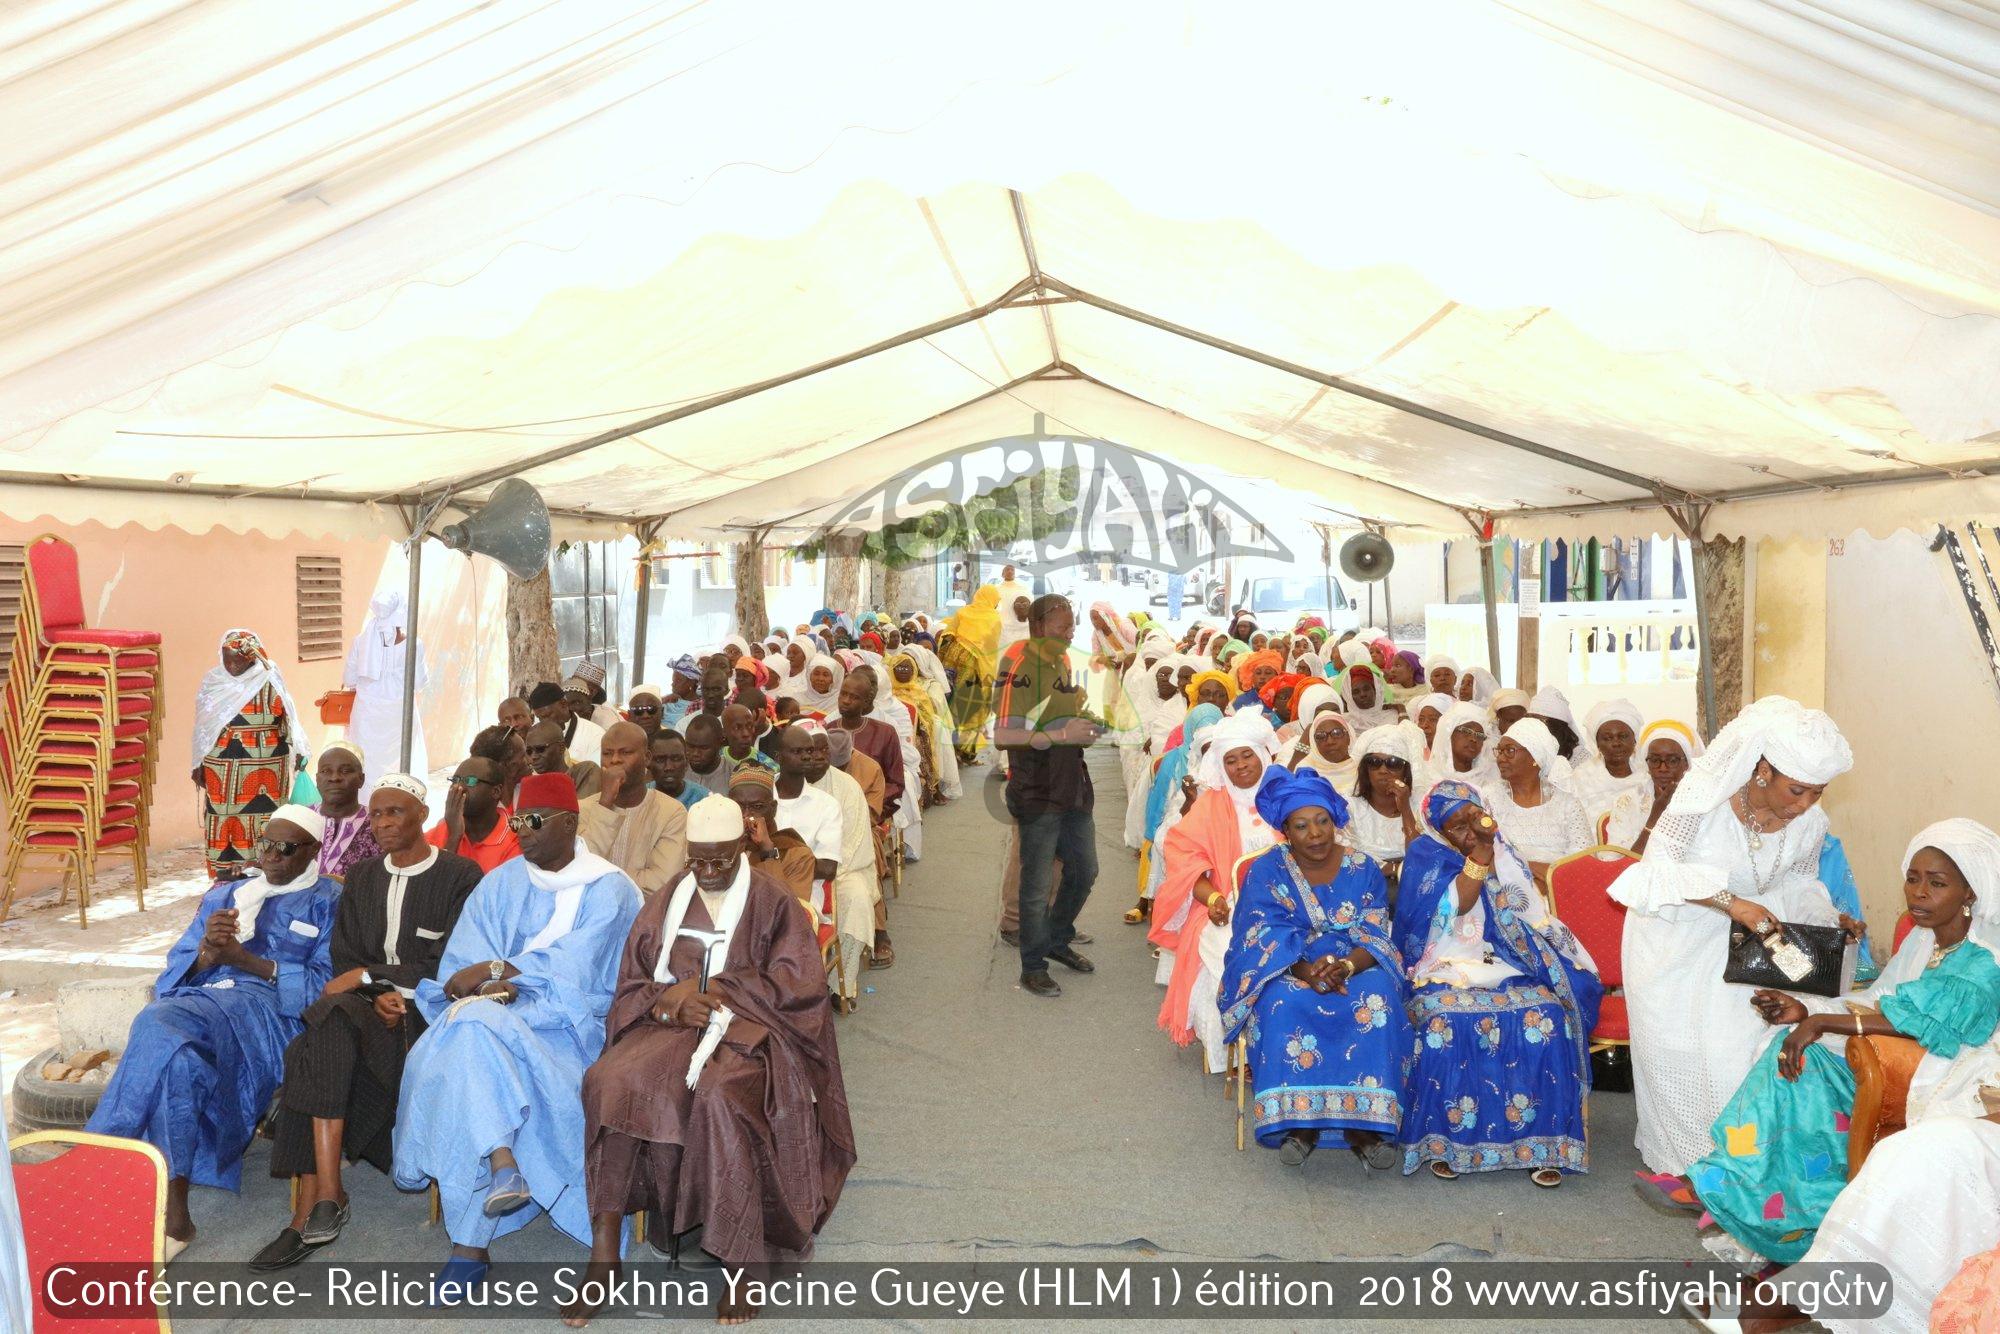 PHOTOS - HLM - Conférence Religieuse organisée par Sokhna Yacine Gueye animée par Oustaz Cheikh Tidiane Biteye